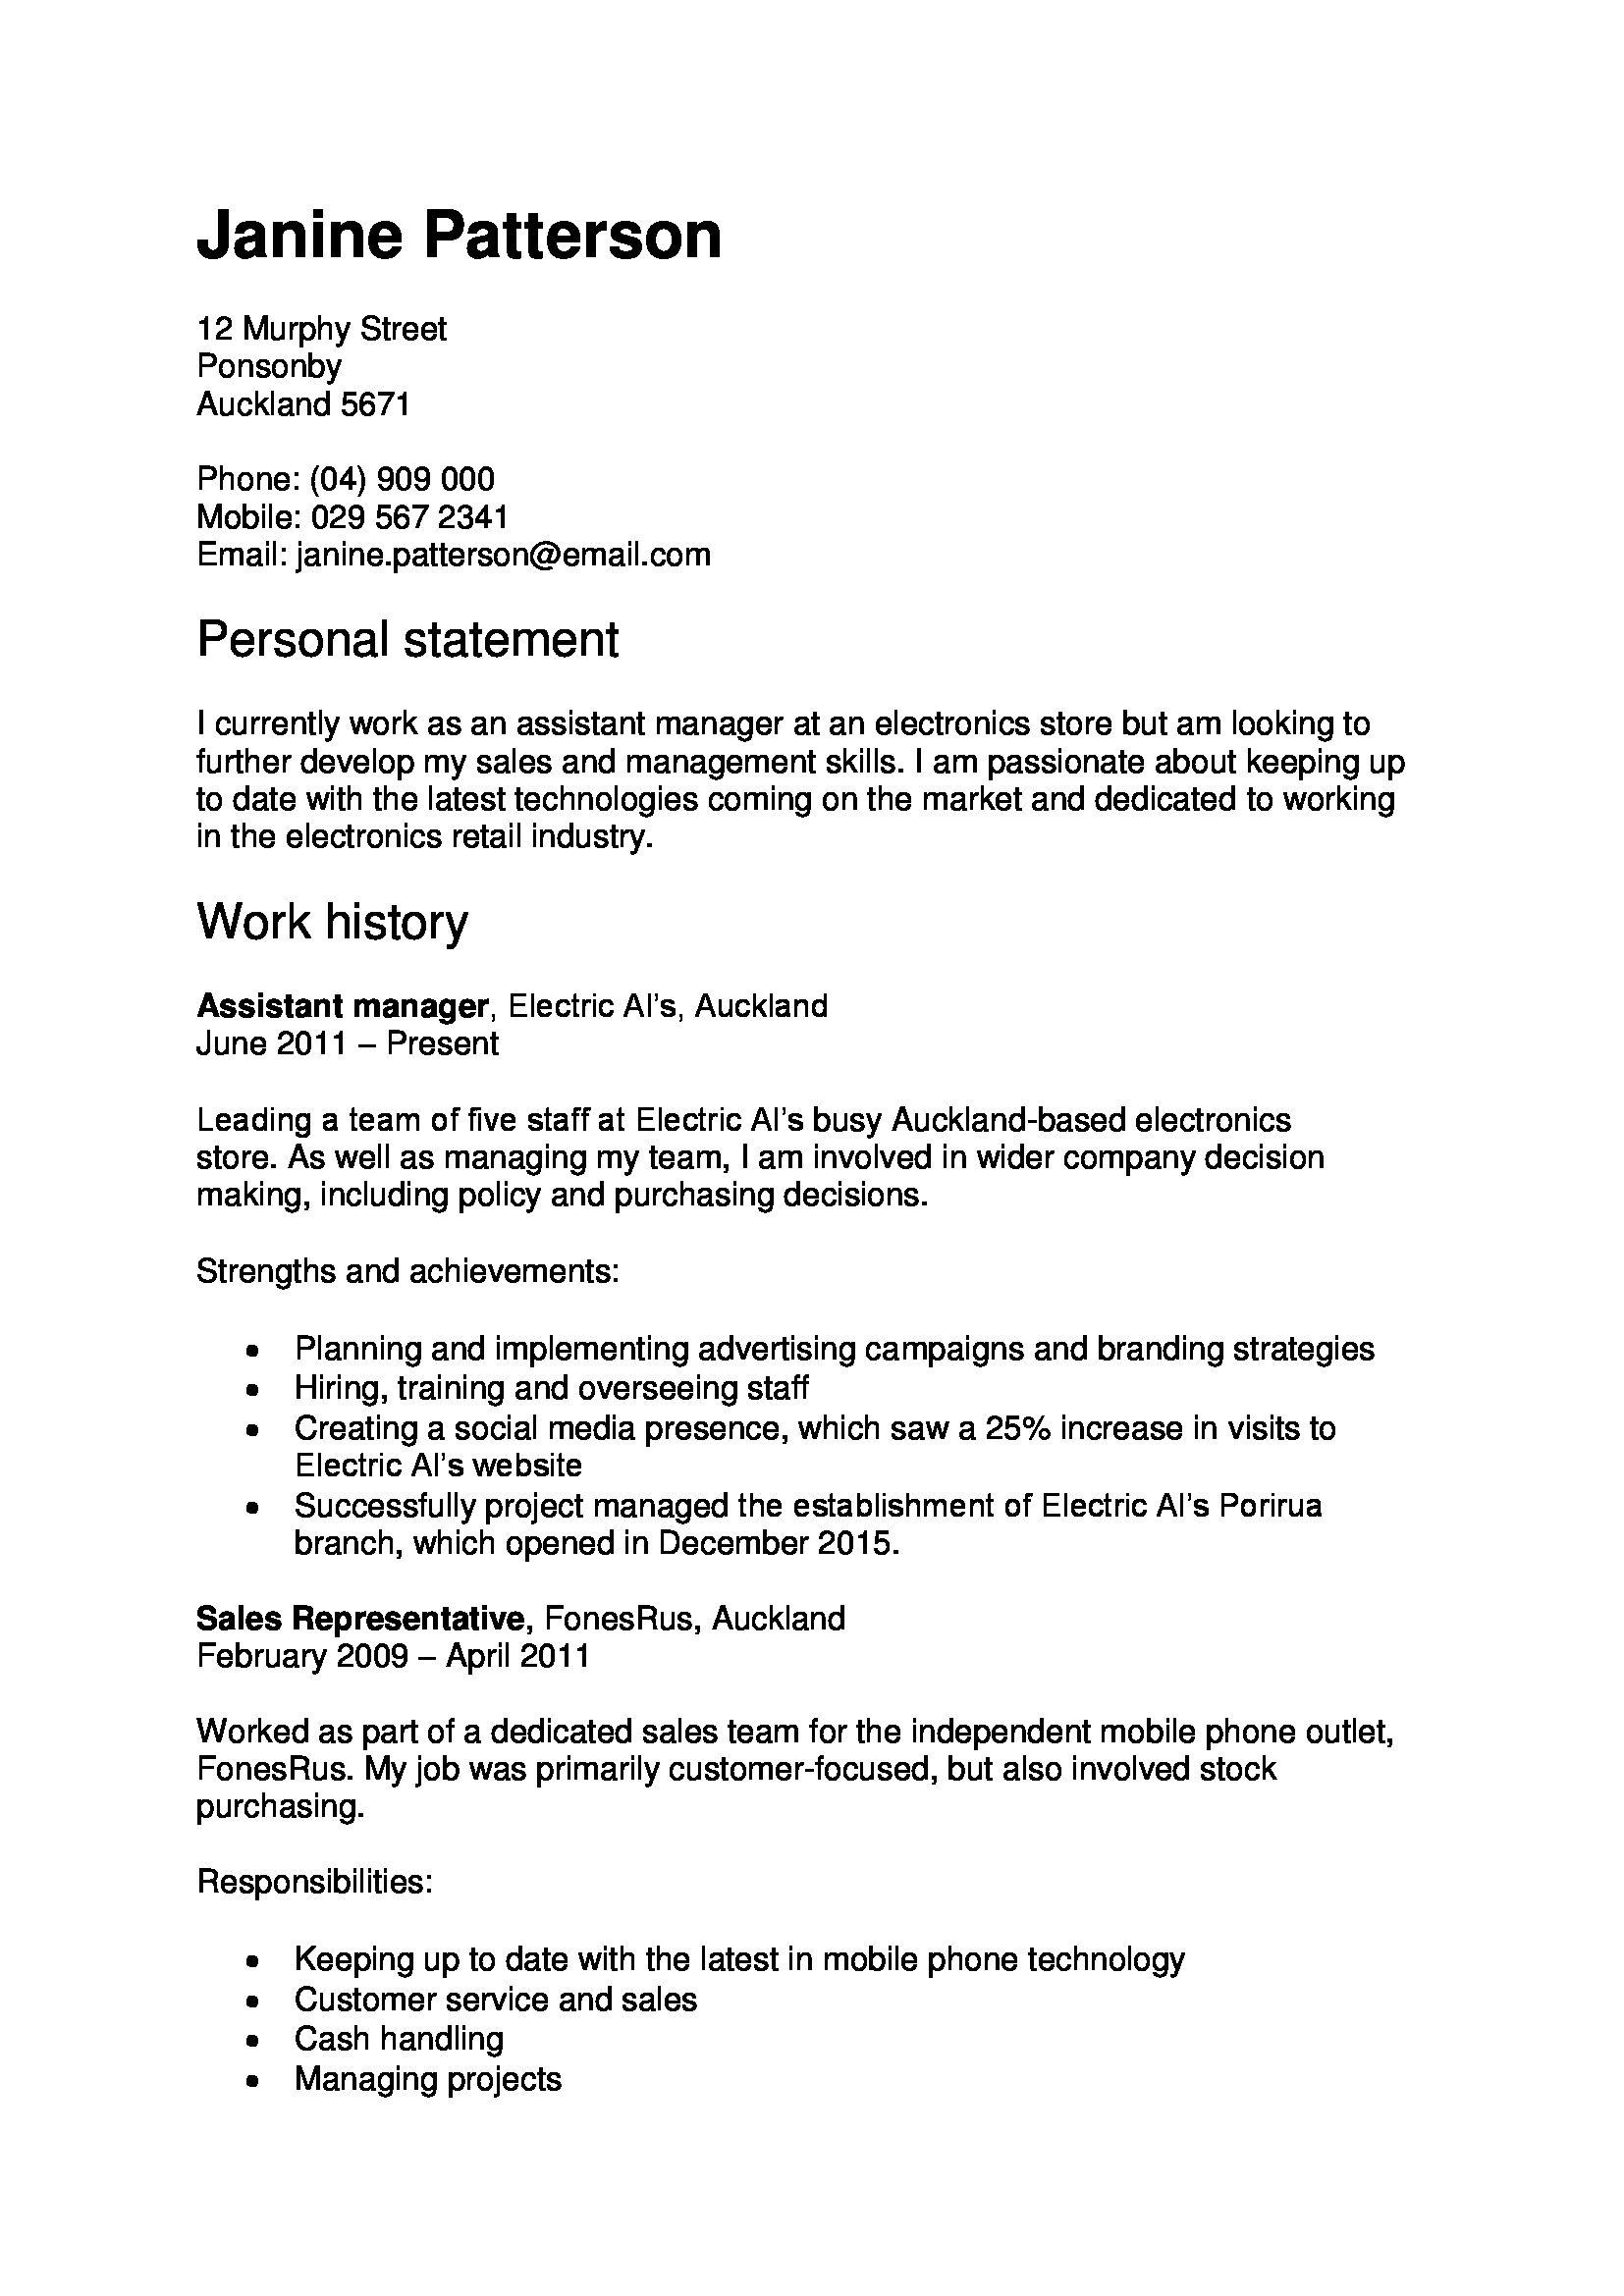 cv or resume in new zealand